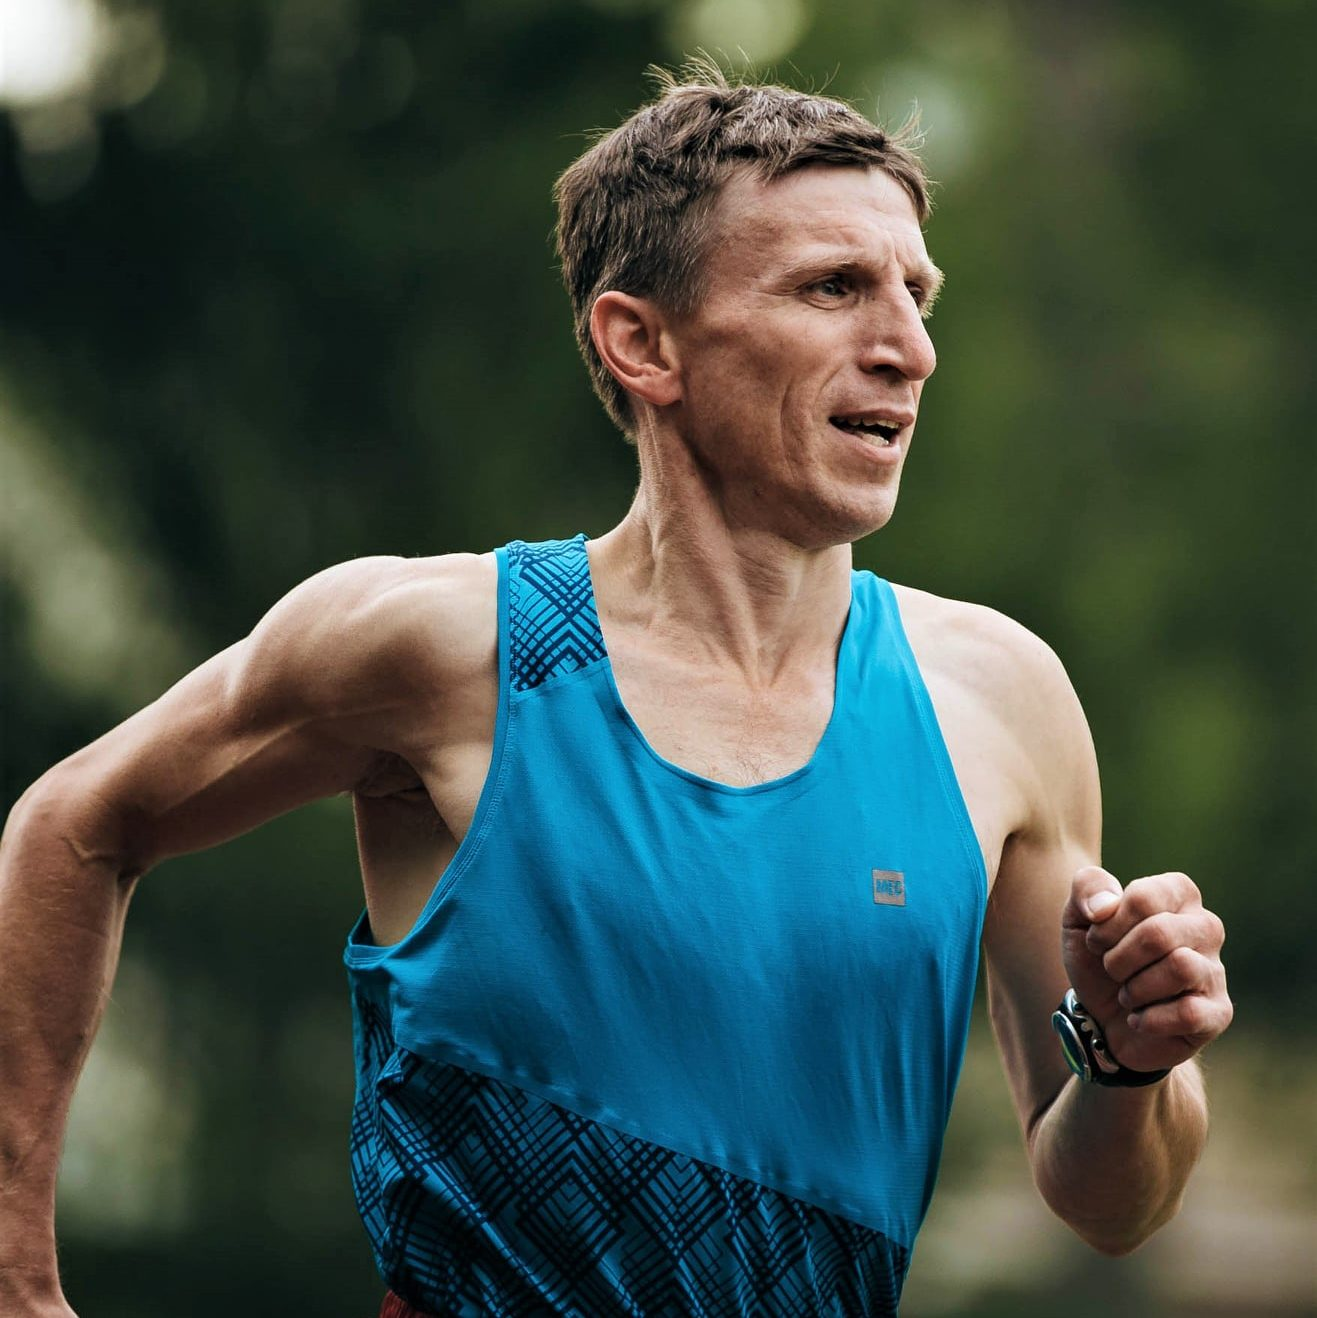 Владимир Метелкин - тренер по бегу